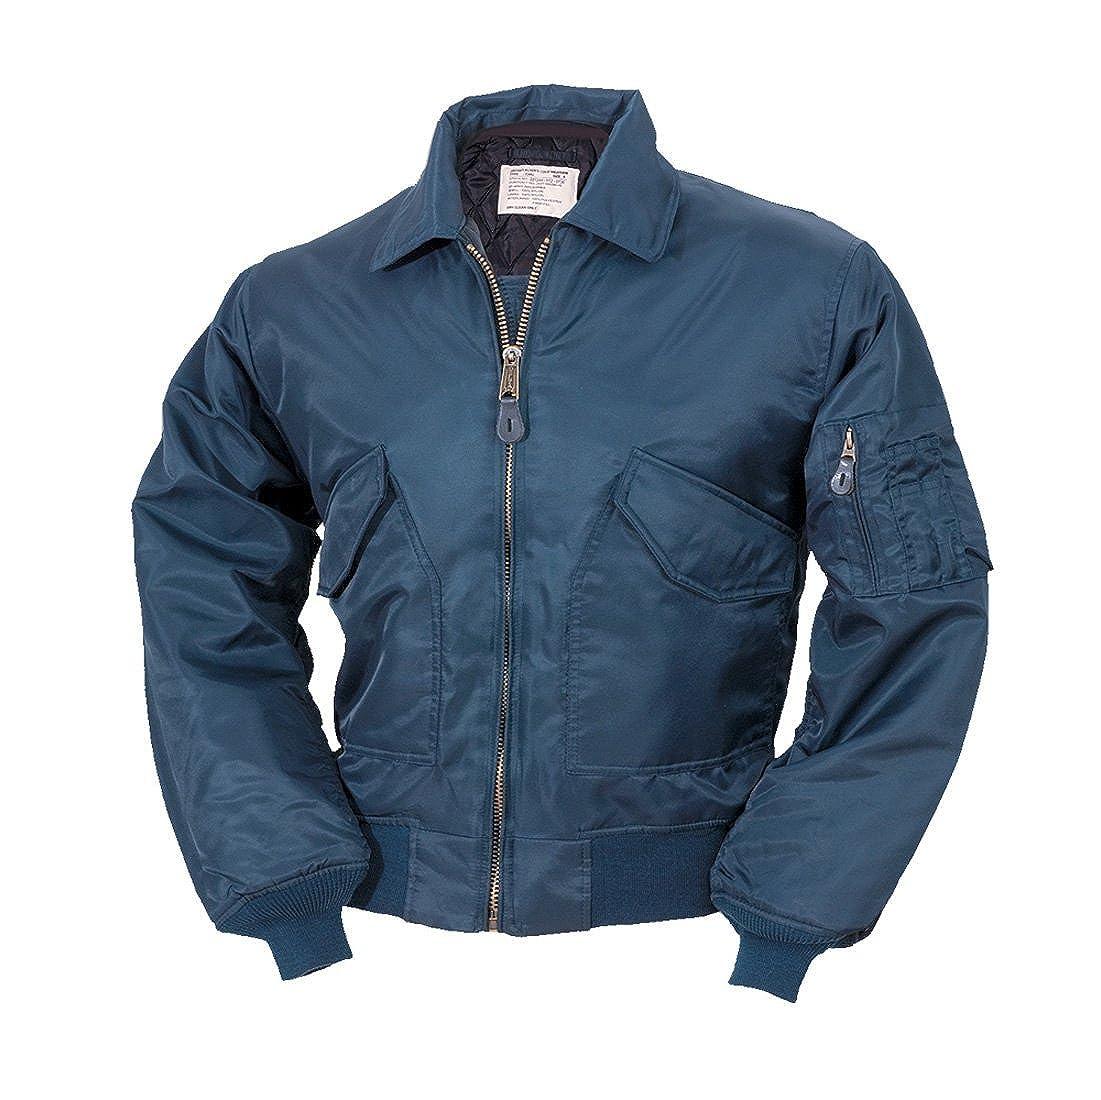 Amazon.com  Delta Men s CWU Ma2 Flight Bomber Us Pilot Airforce Biker  Security Wear Jacket  Clothing 4a5855ab5bd